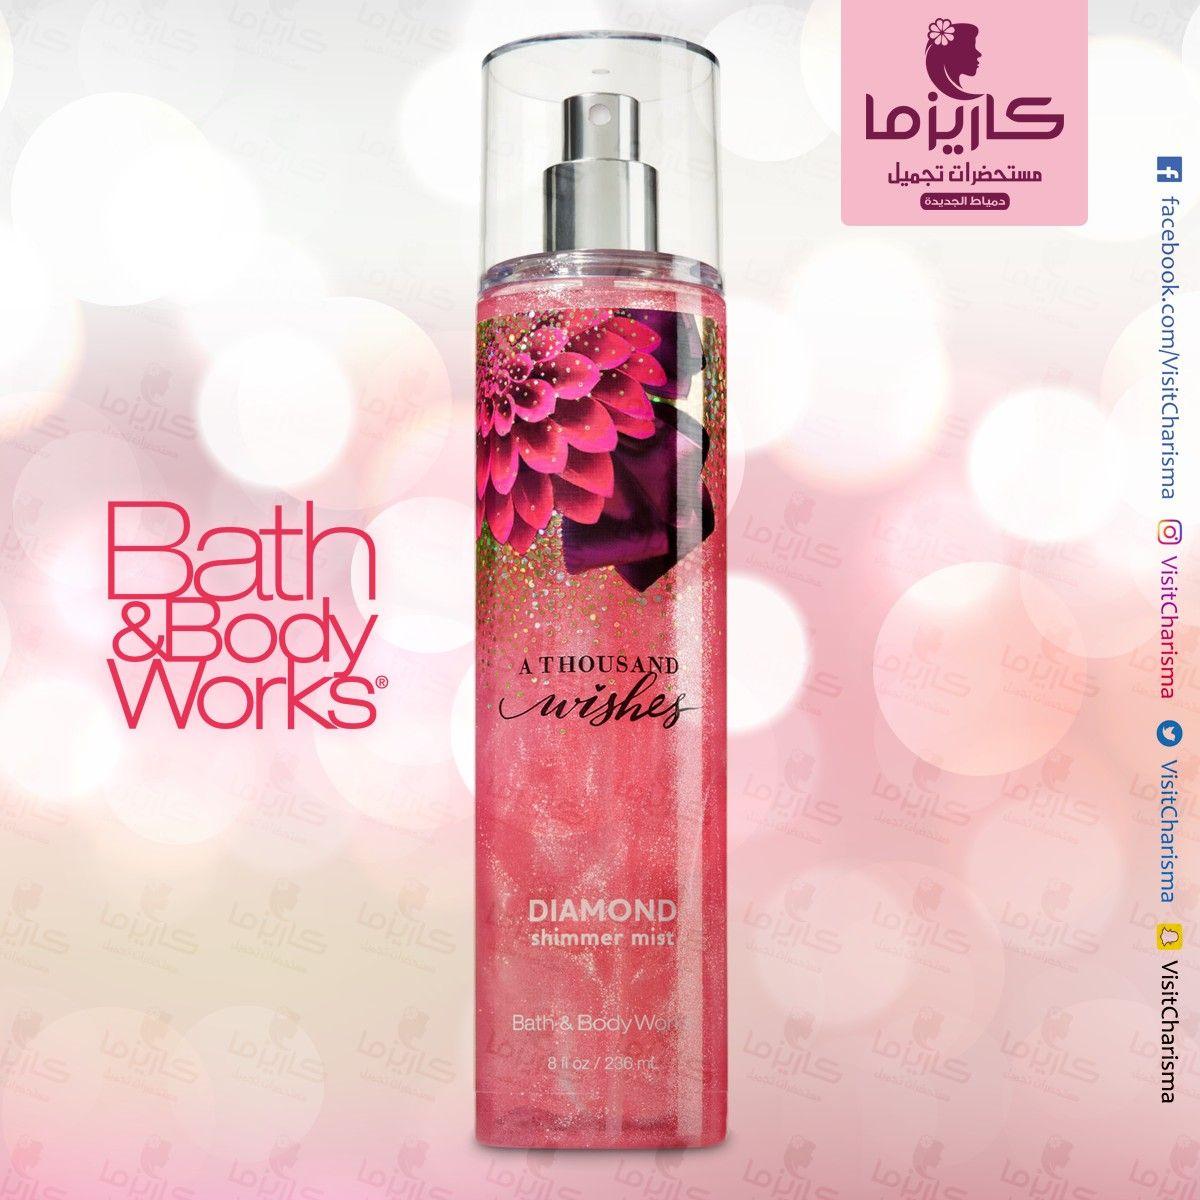 Bath Body Works A Thousand Wishes Diamond Shimmer Mist Original بادي ميست من باث أند بودي وركس الجليتر يعني Perfume Bottles Shimmer Perfume